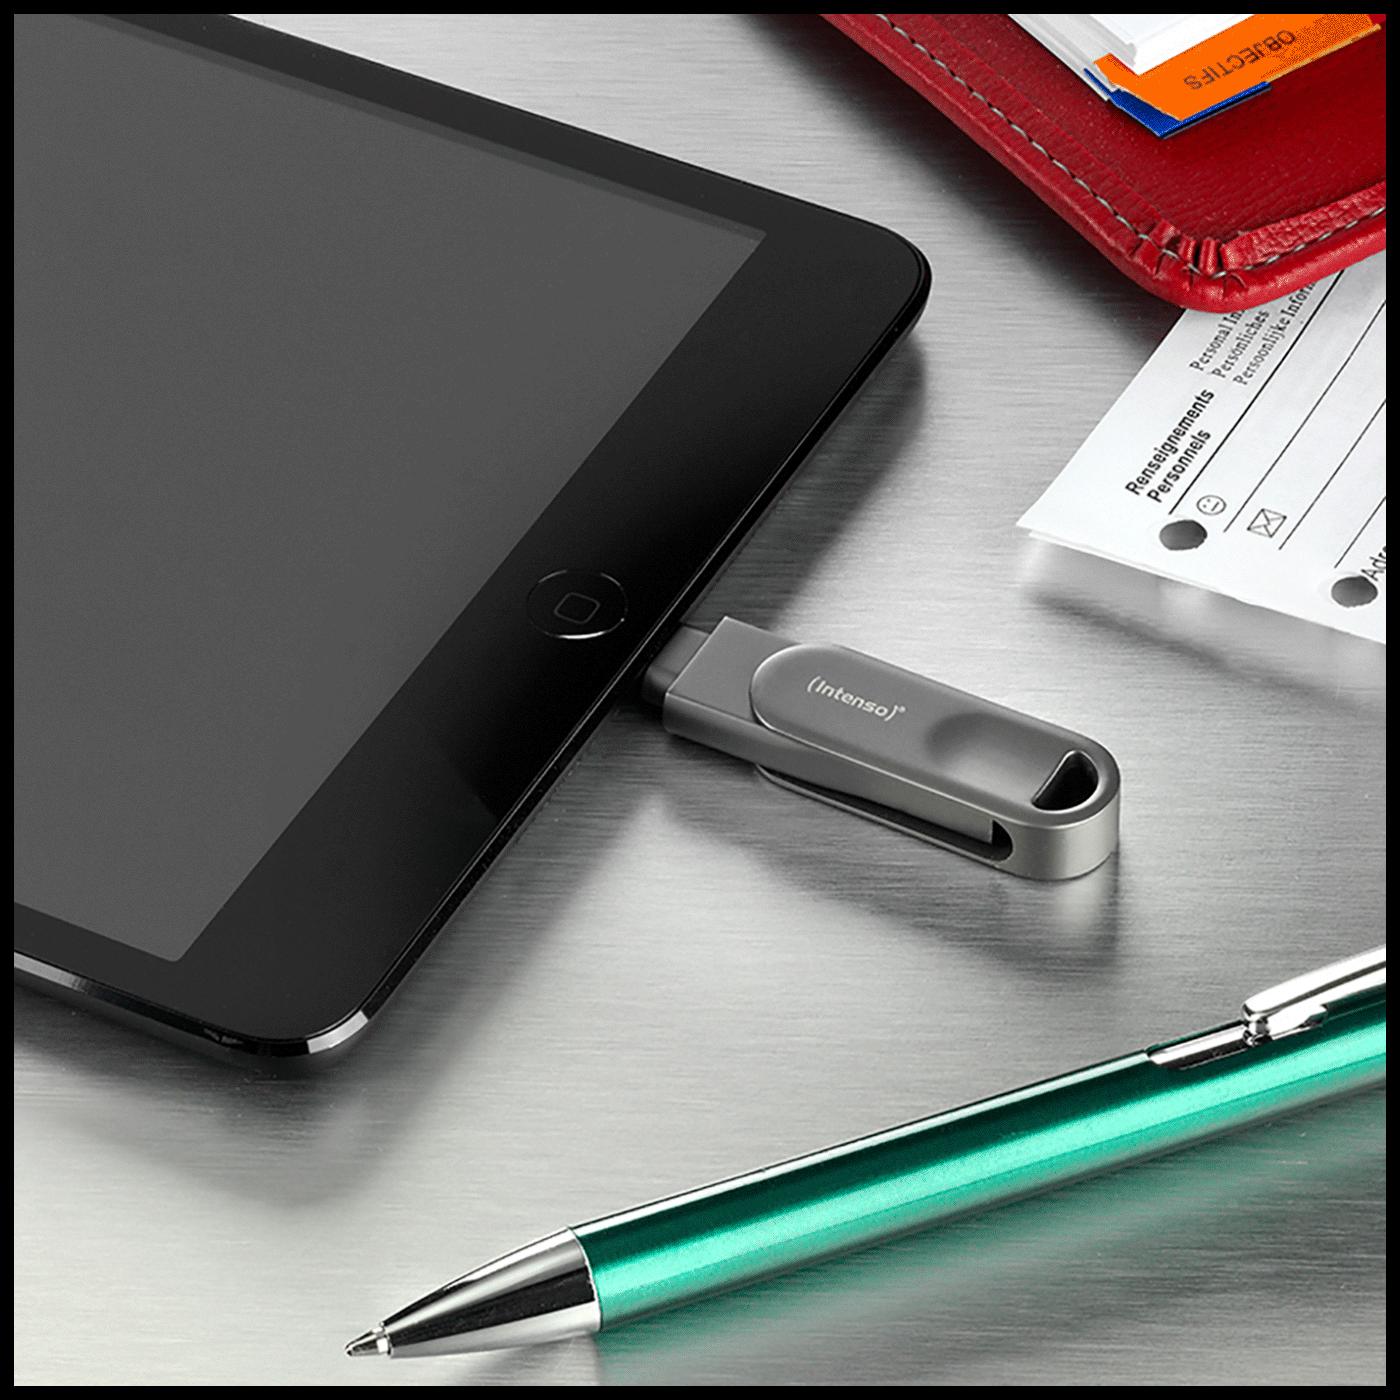 BULK-USB3.0-64GB/iMobile Line Pro